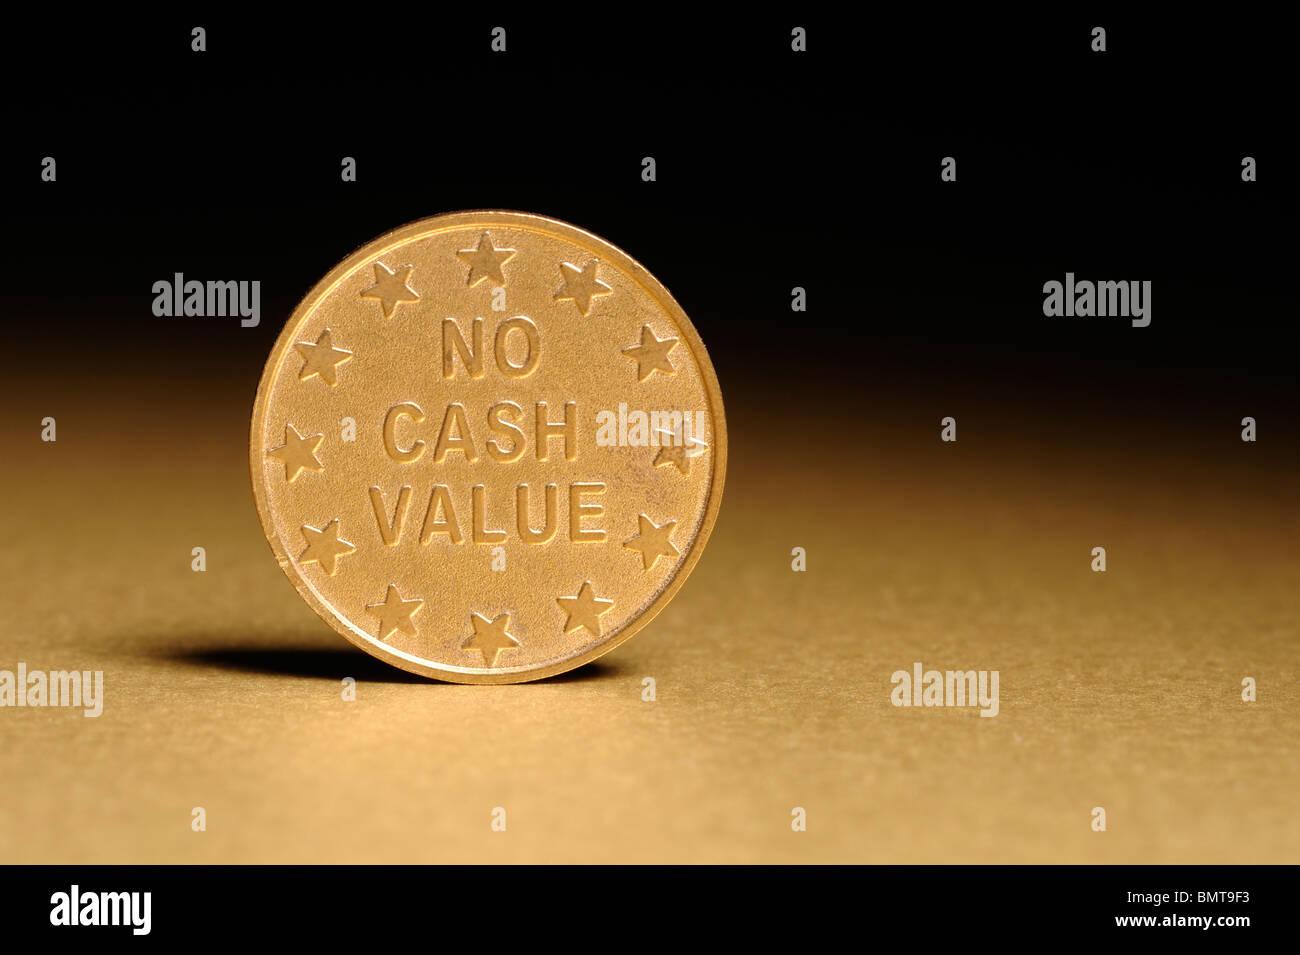 No Cash Value coin - Stock Image